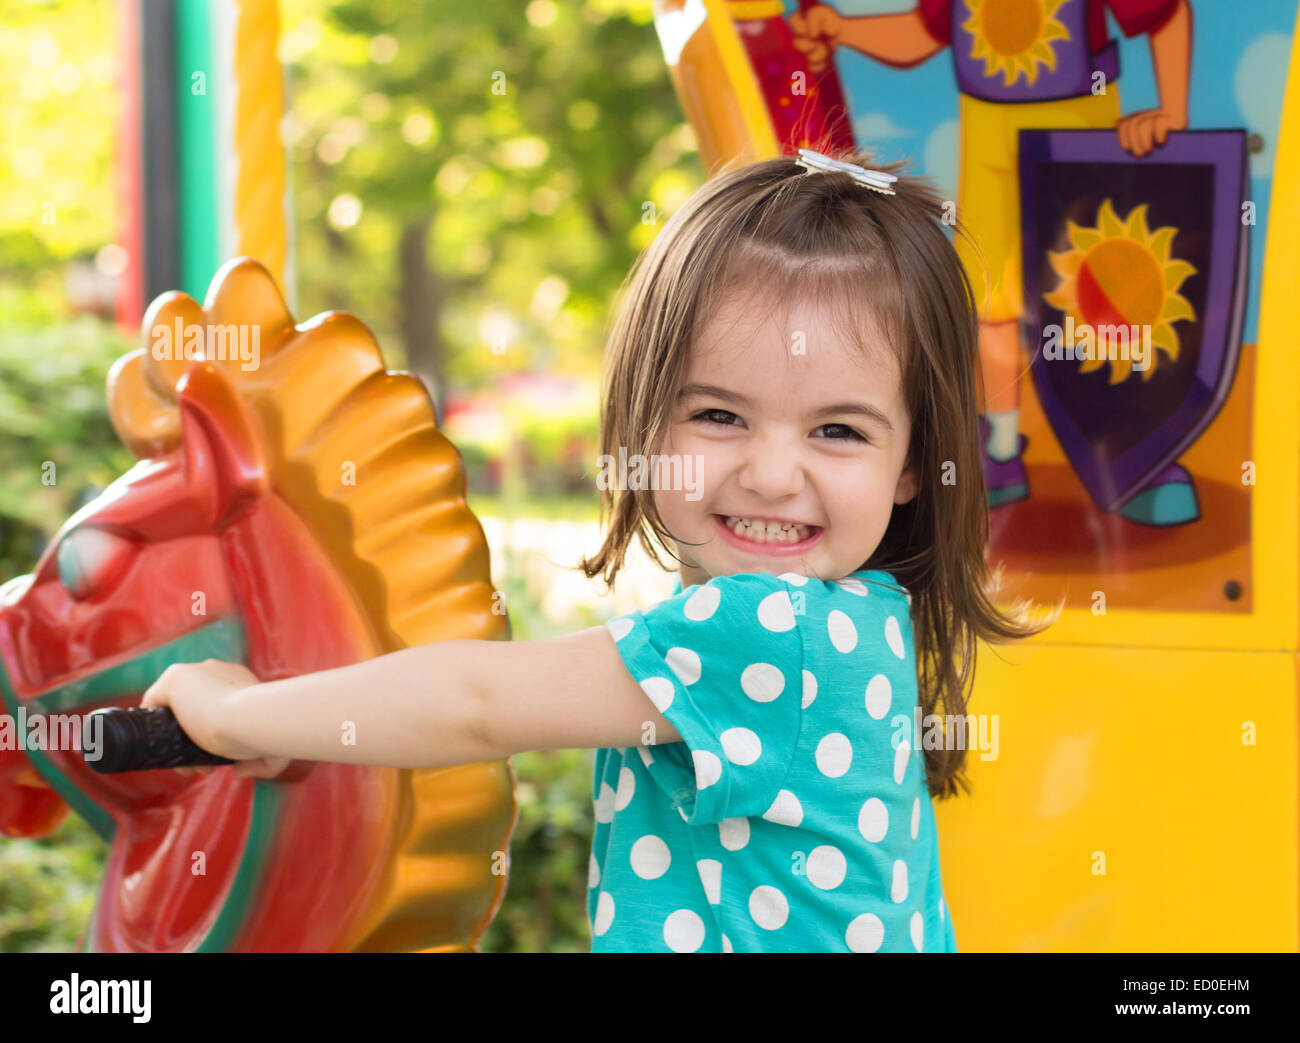 Little girl having fun in park - Stock Image